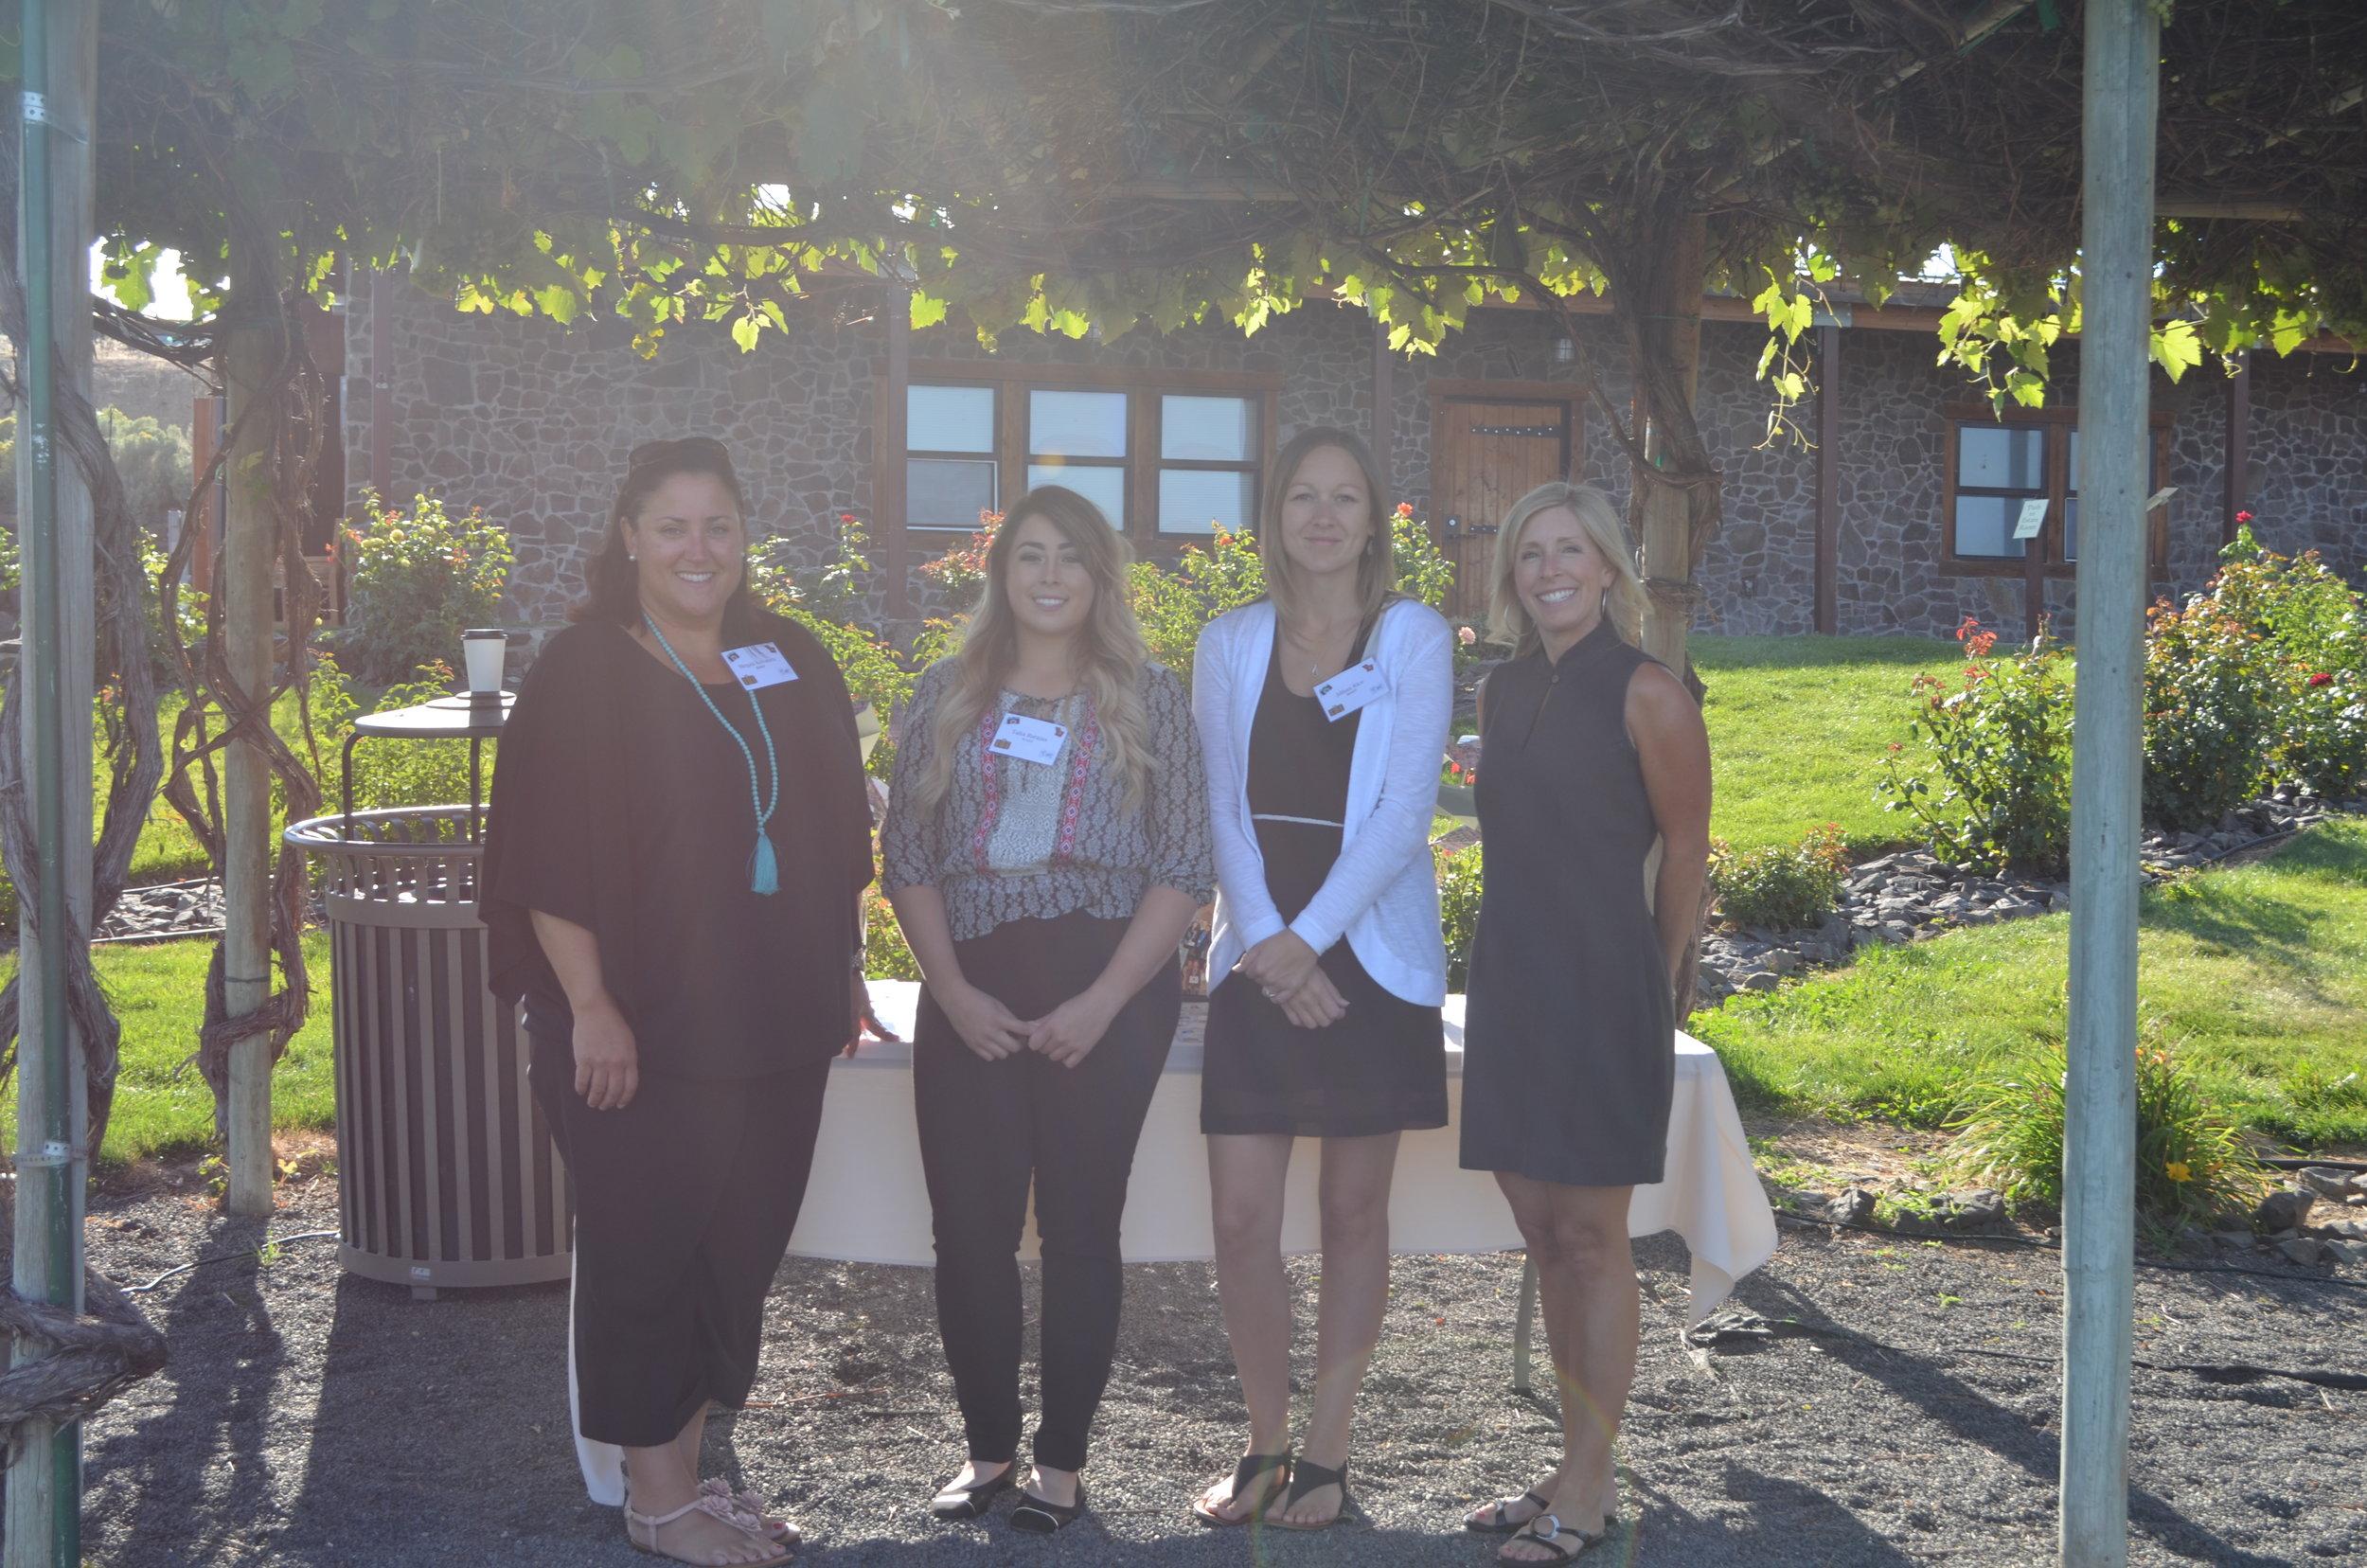 WAEF staff left to right Megan Kovanen, Talia Barajas, Jillian Rice and Jennifer Witherbee